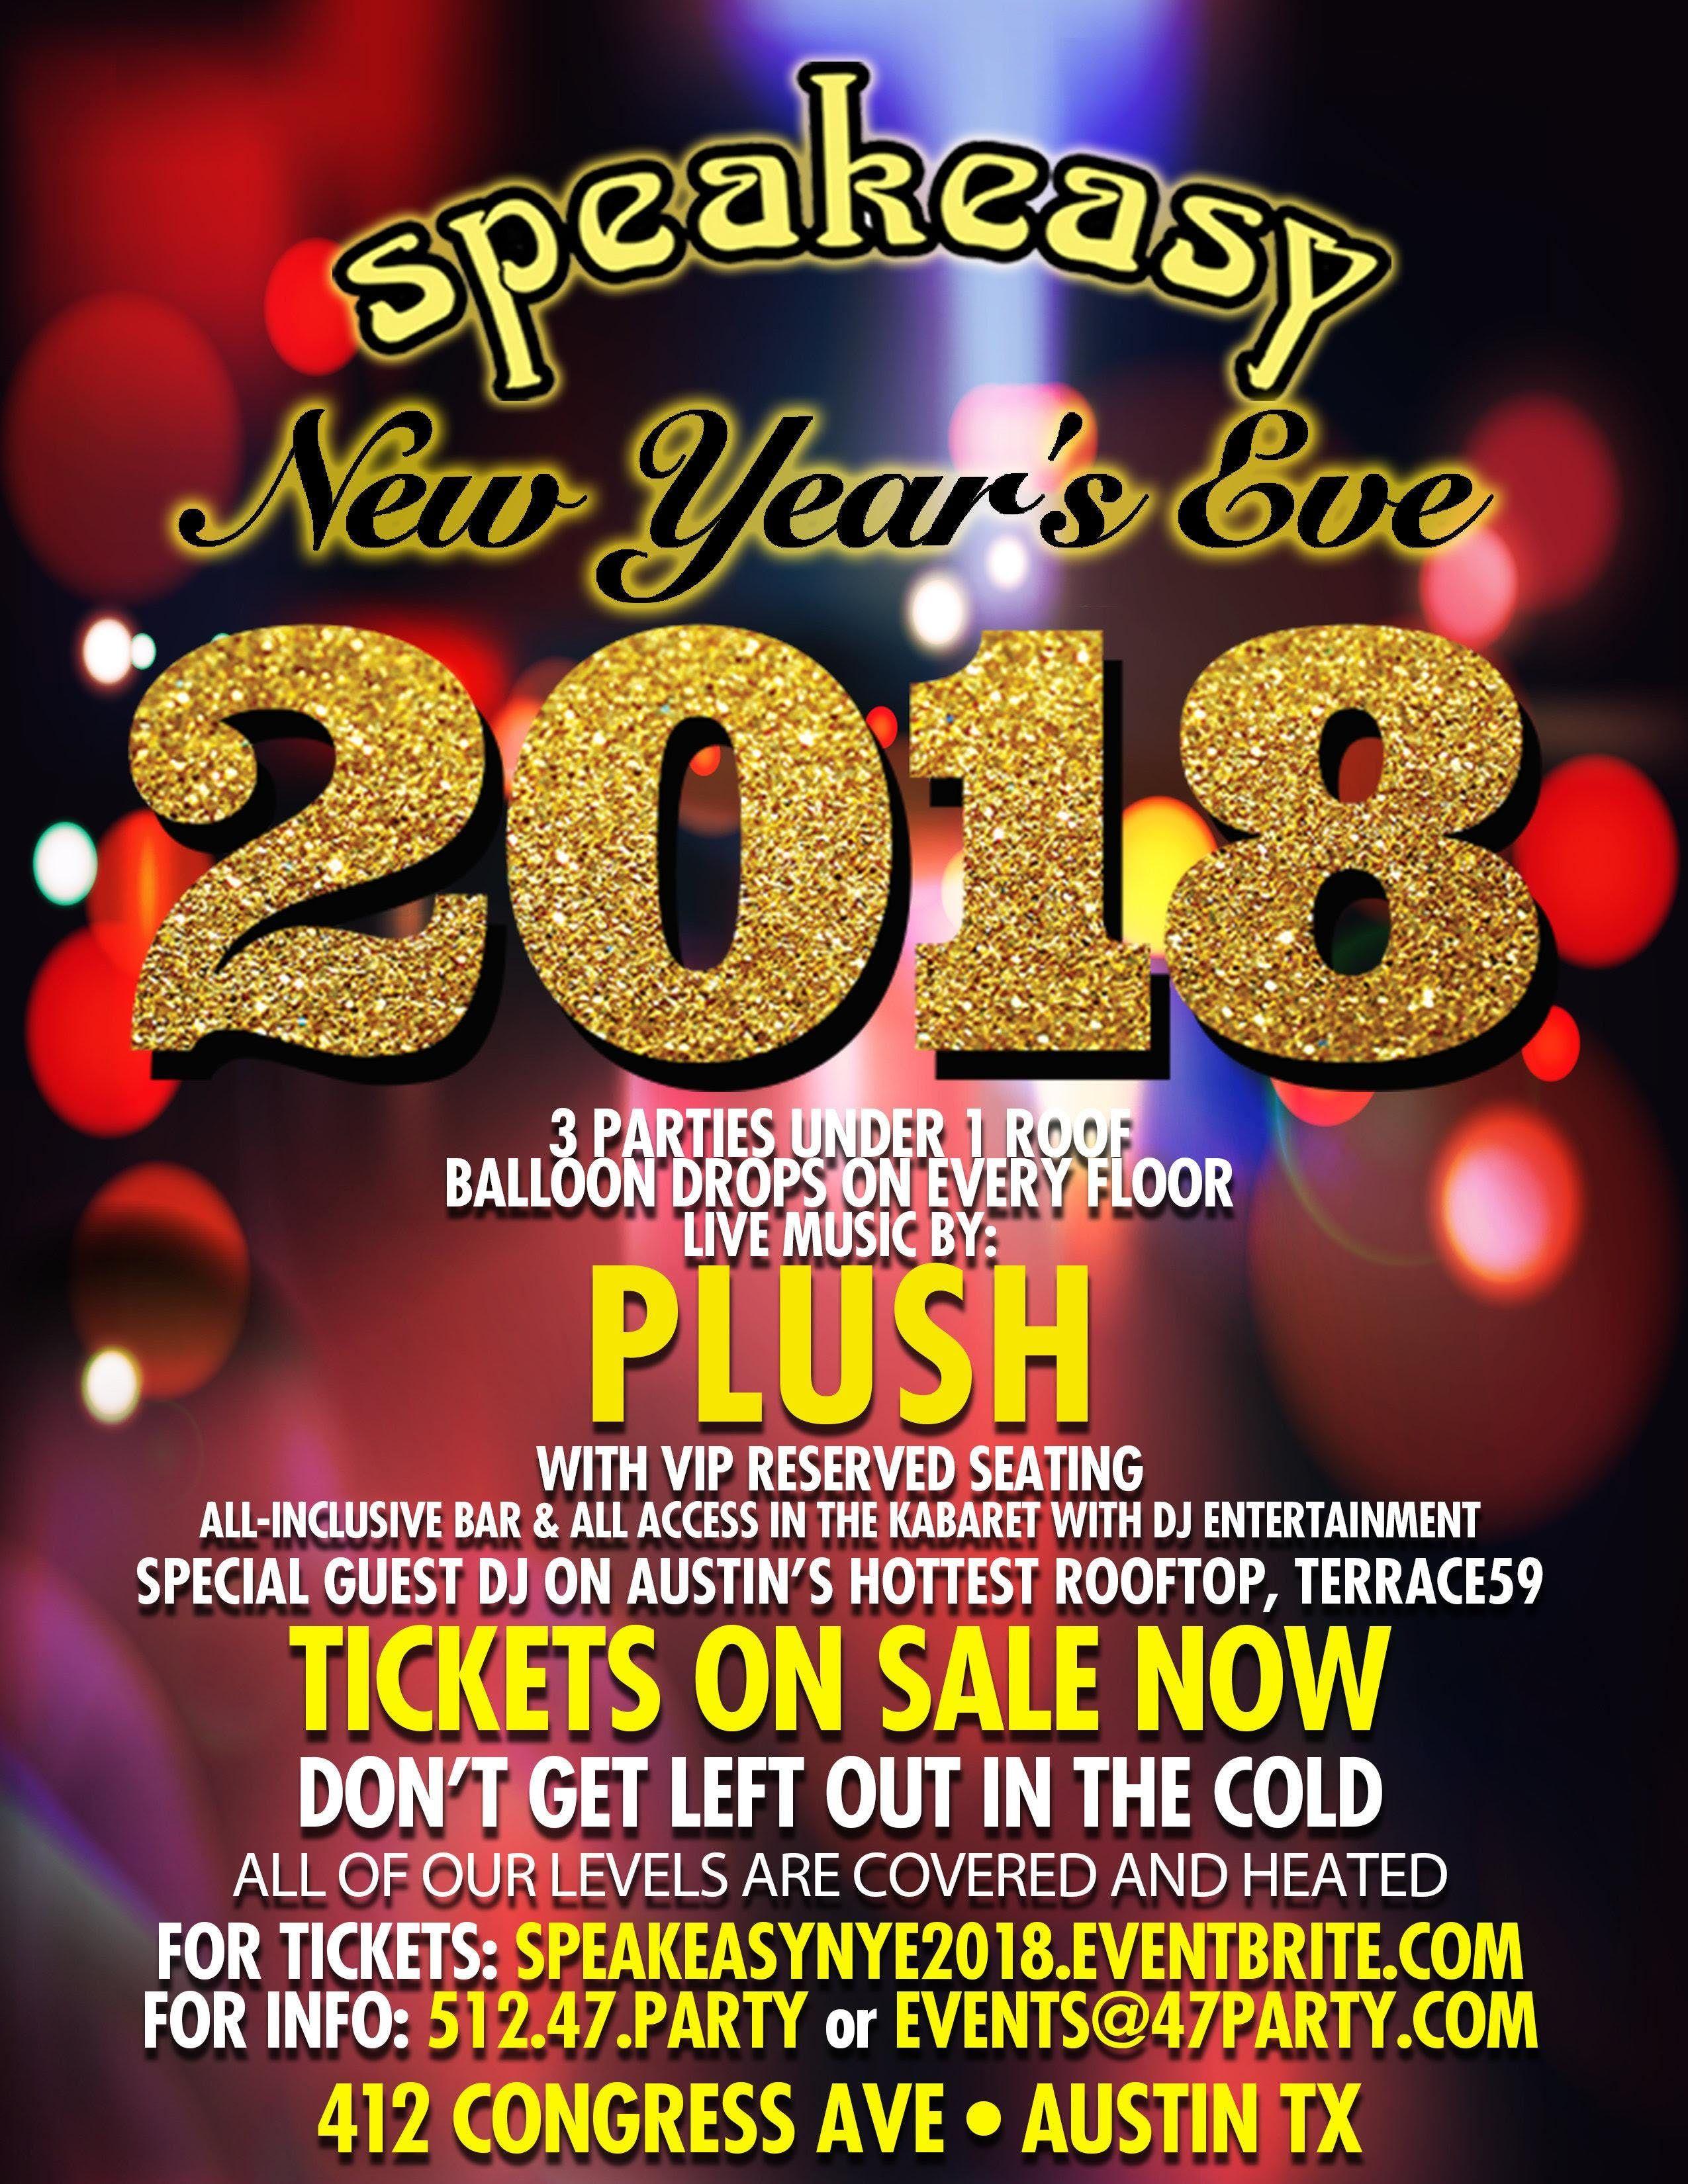 Speakeasys Legendary New Years Eve Bash 2018